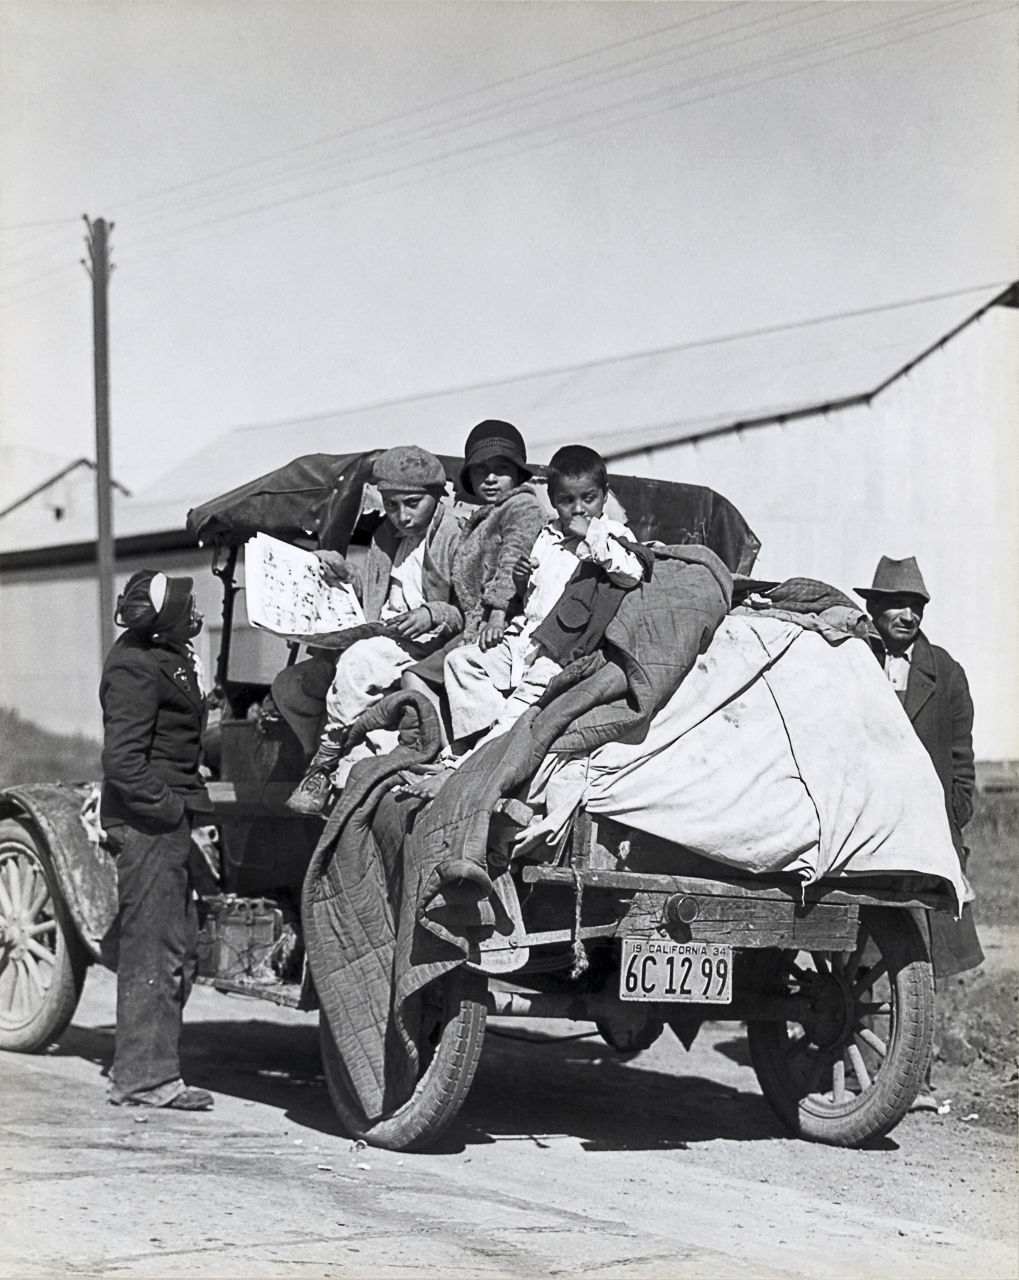 Dorothea Lange, <em>Establishment of rural rehabilitation camps for migrants in California.</em> March 15, 1935